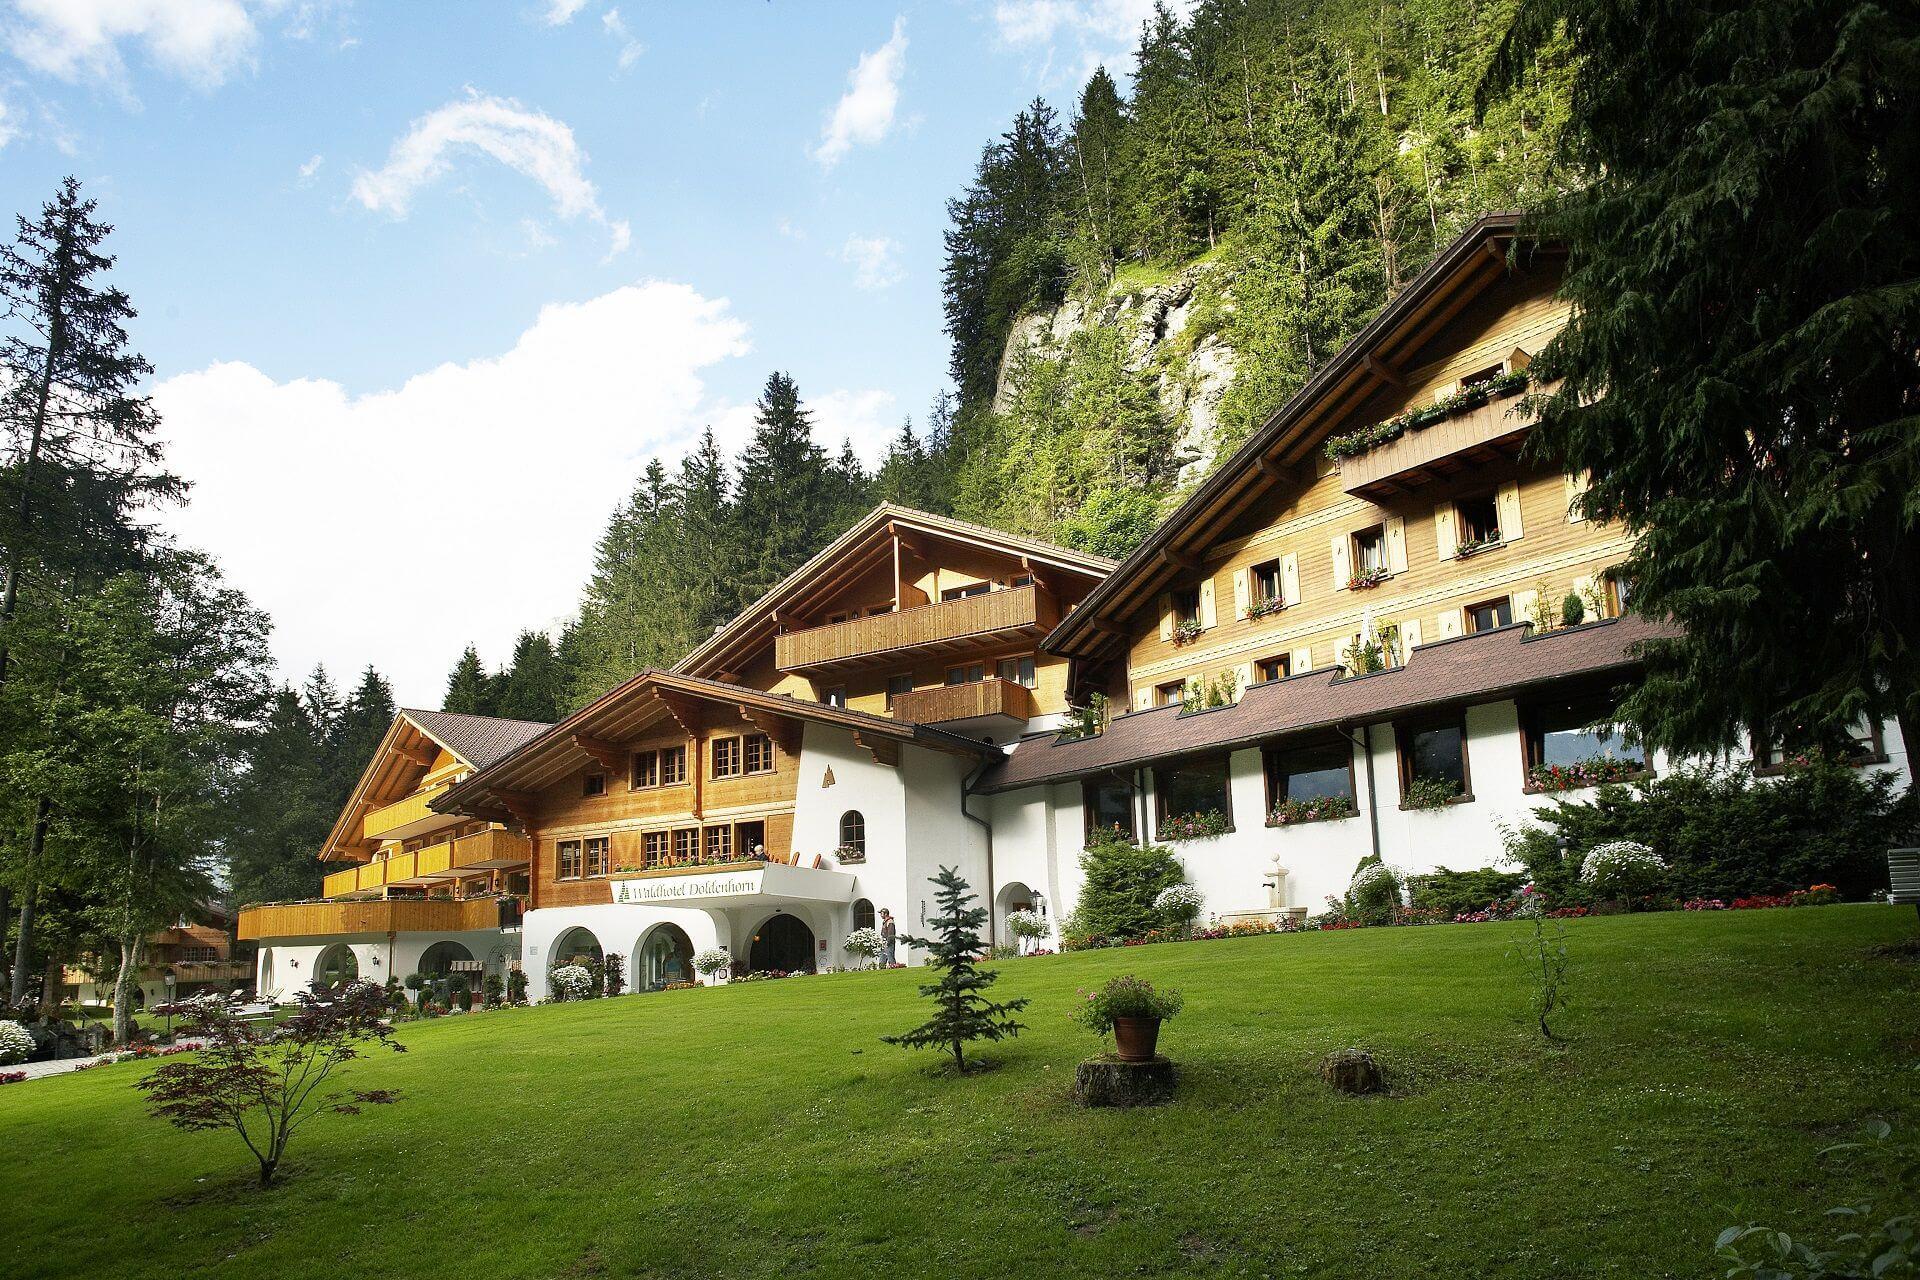 3-tage-im-waldhotel-doldenhorn-in-kandersteg